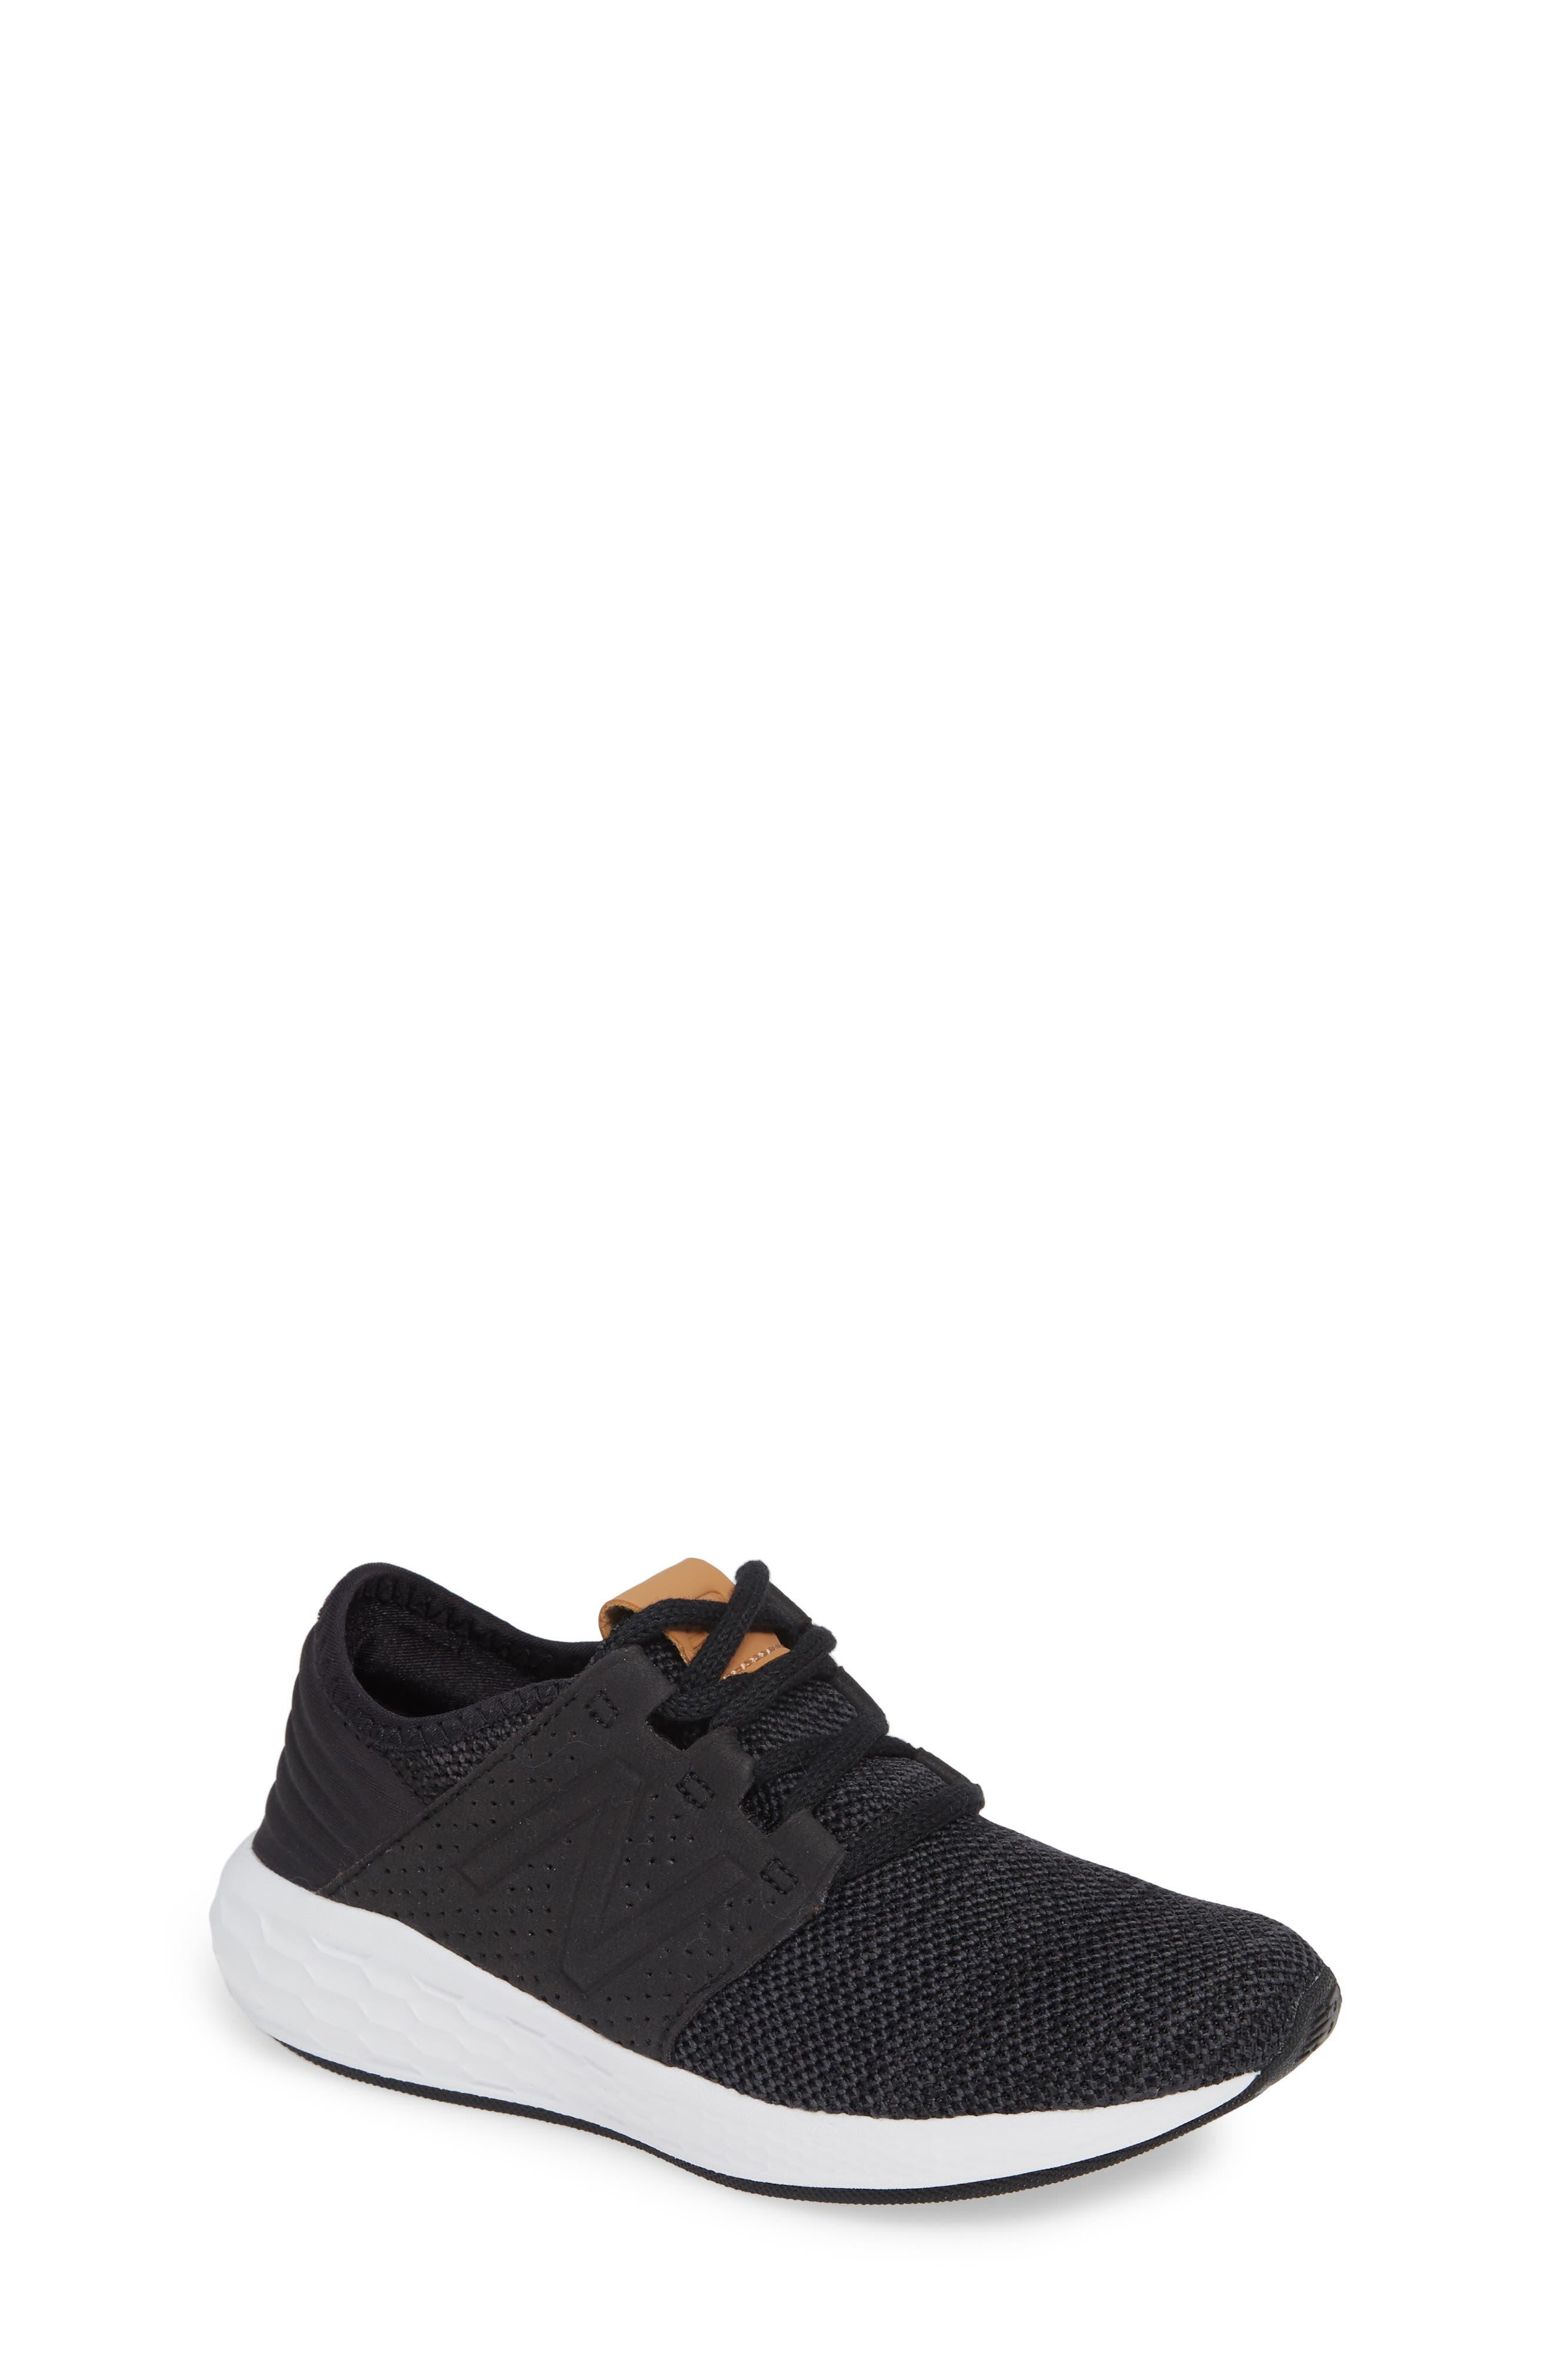 Toddler New Balance Cruz V2 Sport Sneaker Size 15 M  Black